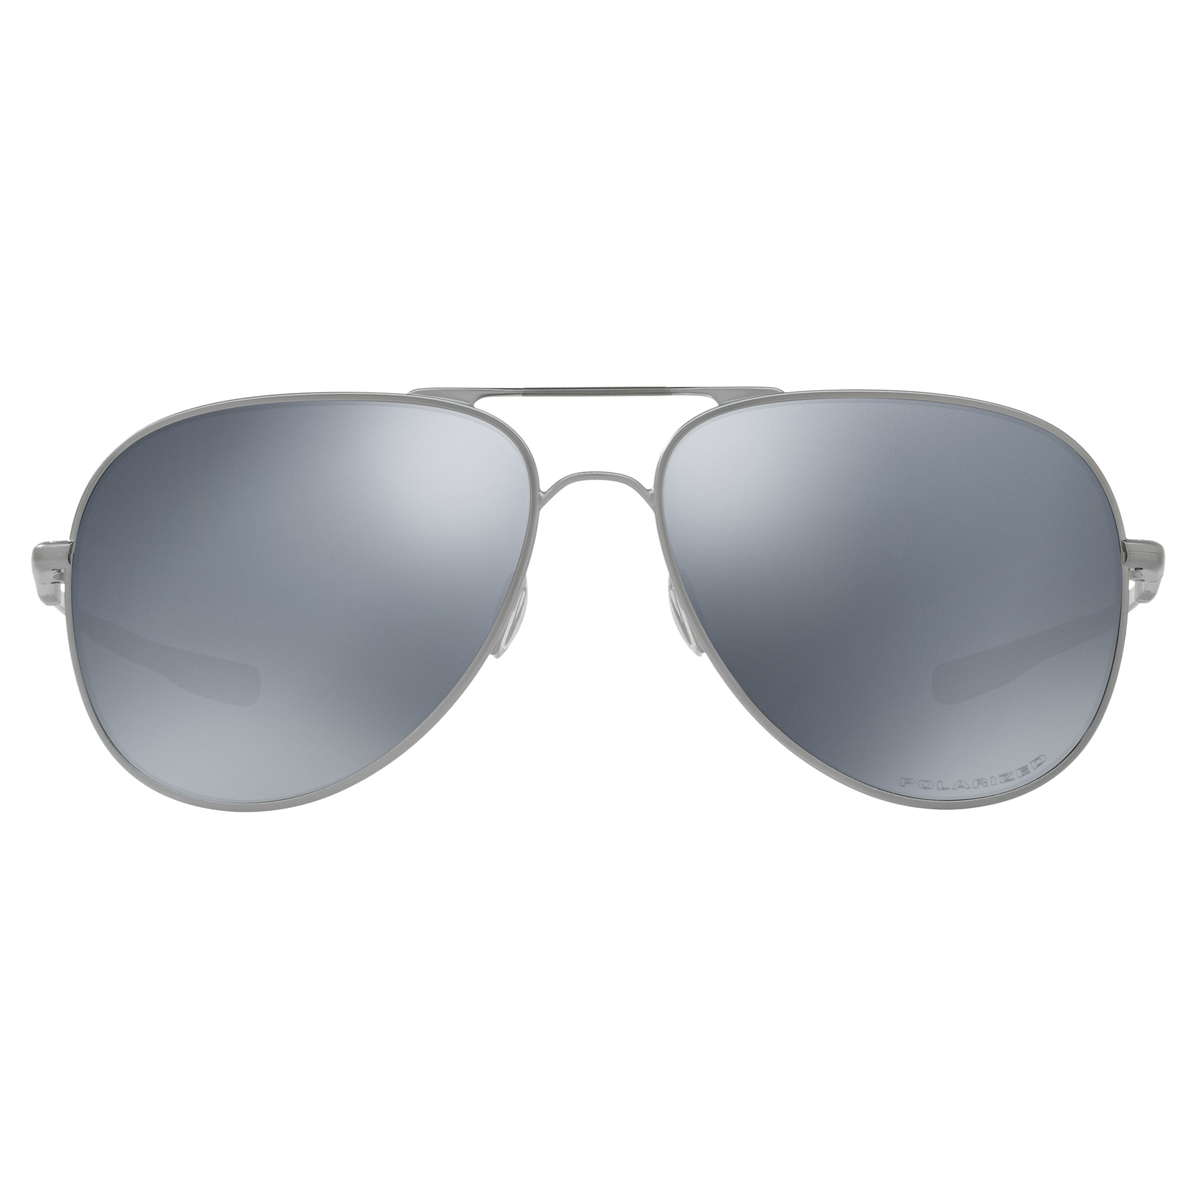 f0290b8e48a42 Óculos Oakley Elmont L Lead  Lente Black Iridium Polarizado ref OO4119-06